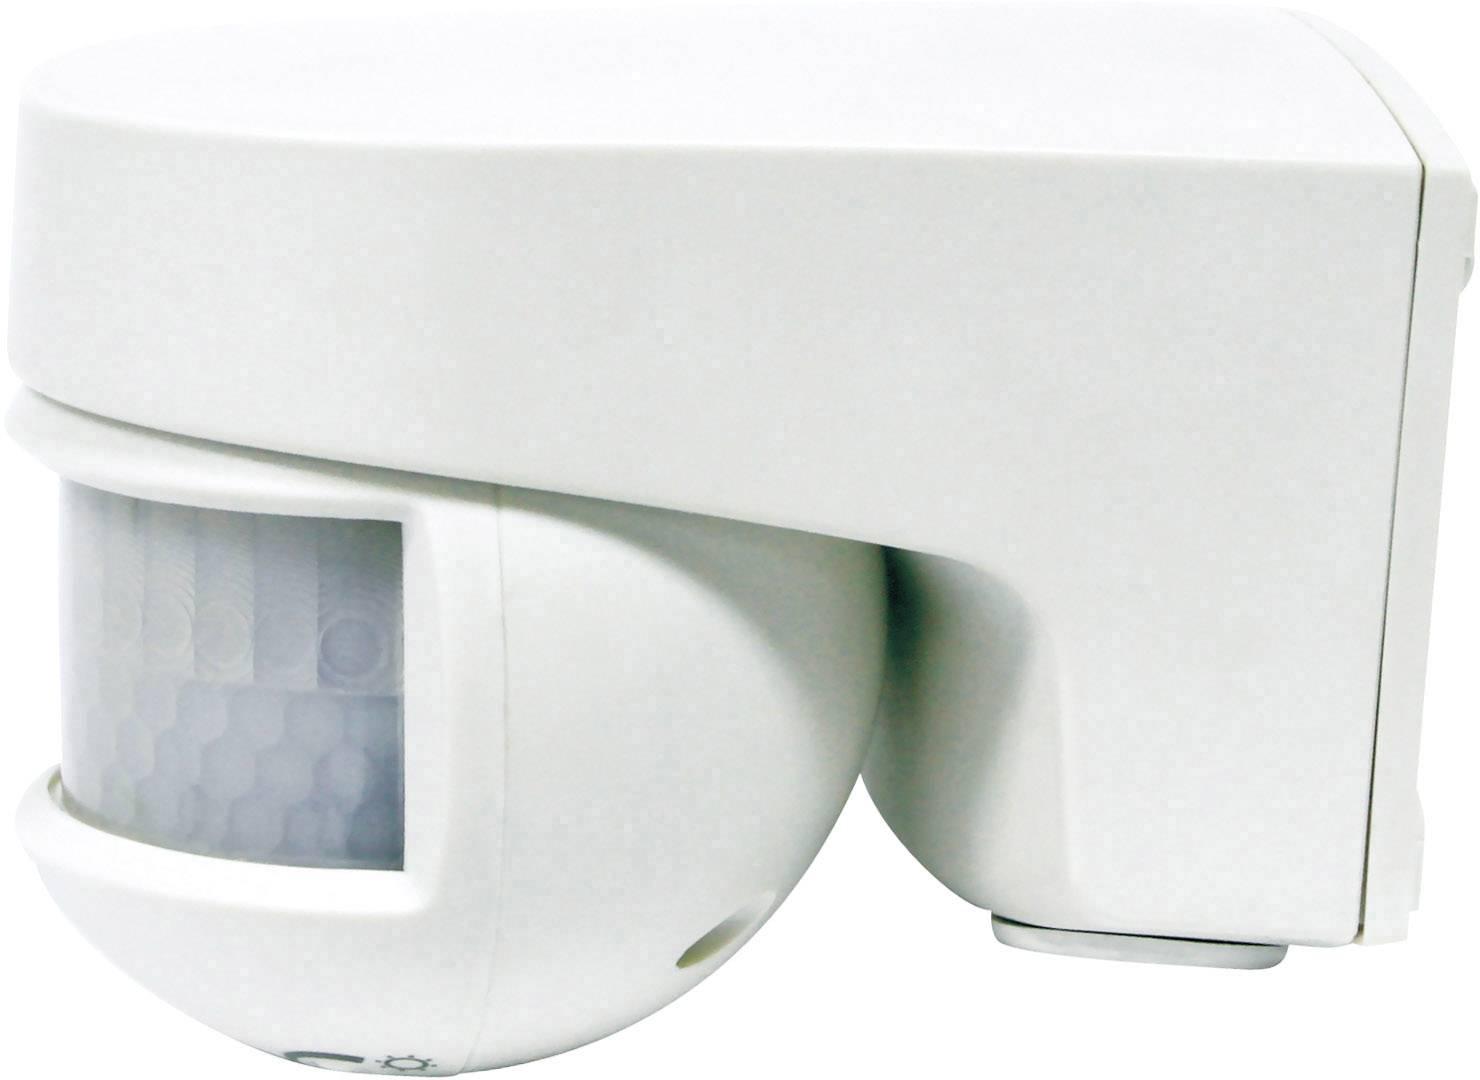 ORBIS Zeitschalttechnik OB134112 parete Rilevatore di movimento 200 ° Bianco IP55